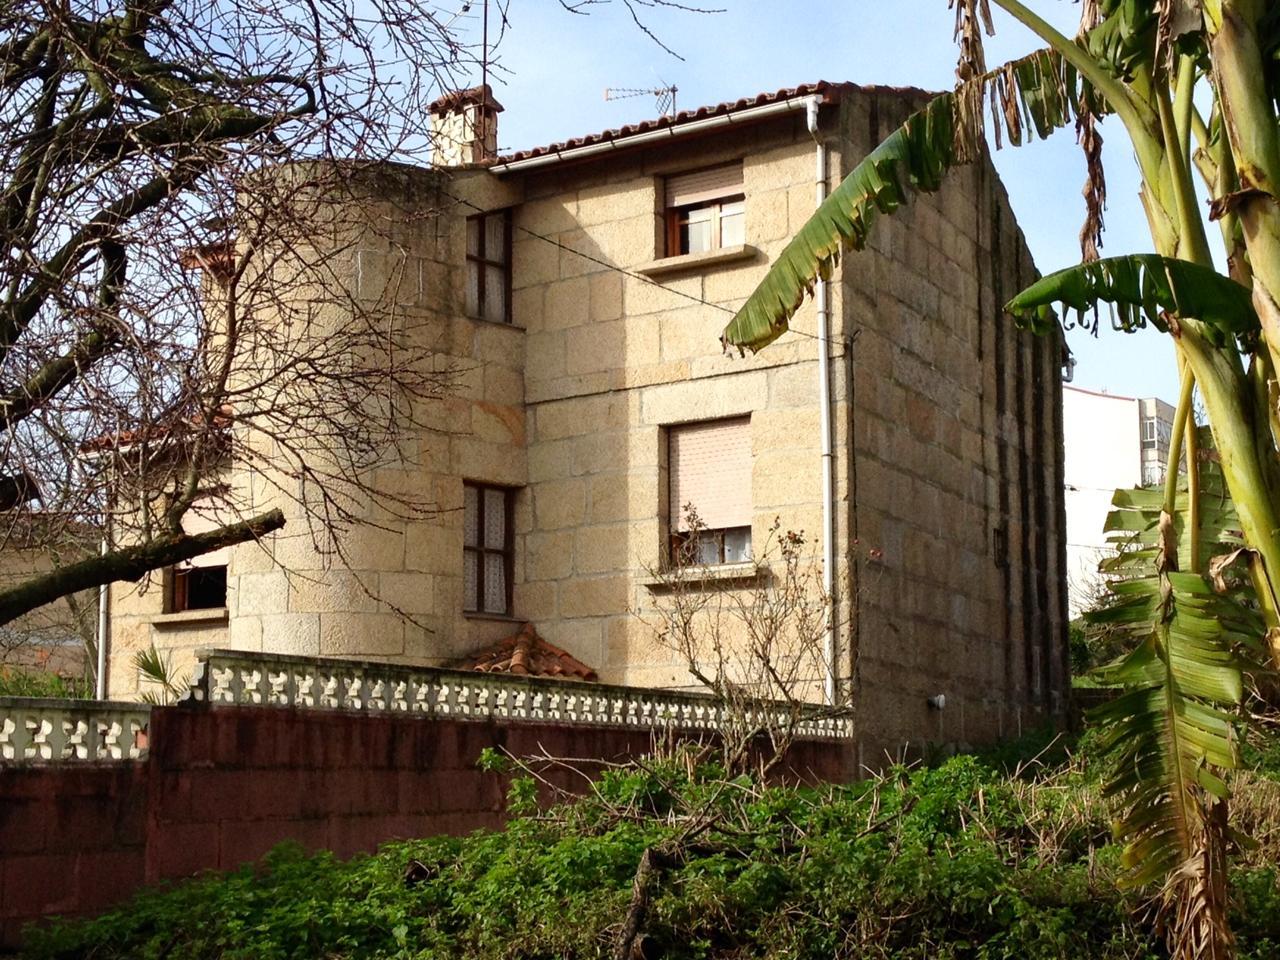 Nexo vigo inmobiliaria casa chalet en venta en vigo de 240 m2 - Telefono casa del libro vigo ...